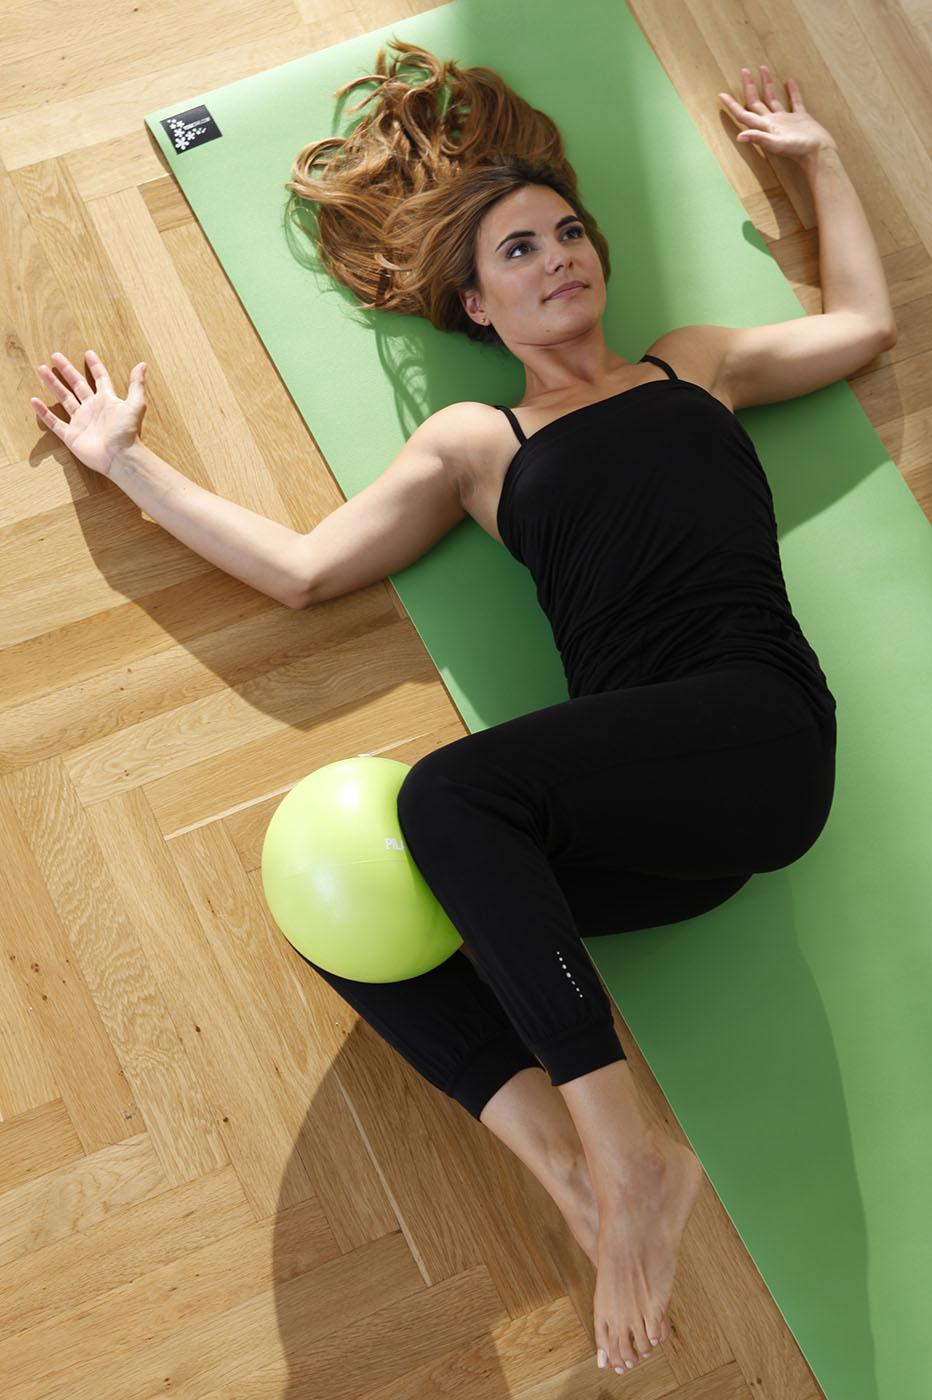 Pilates ball - Ø 23cm